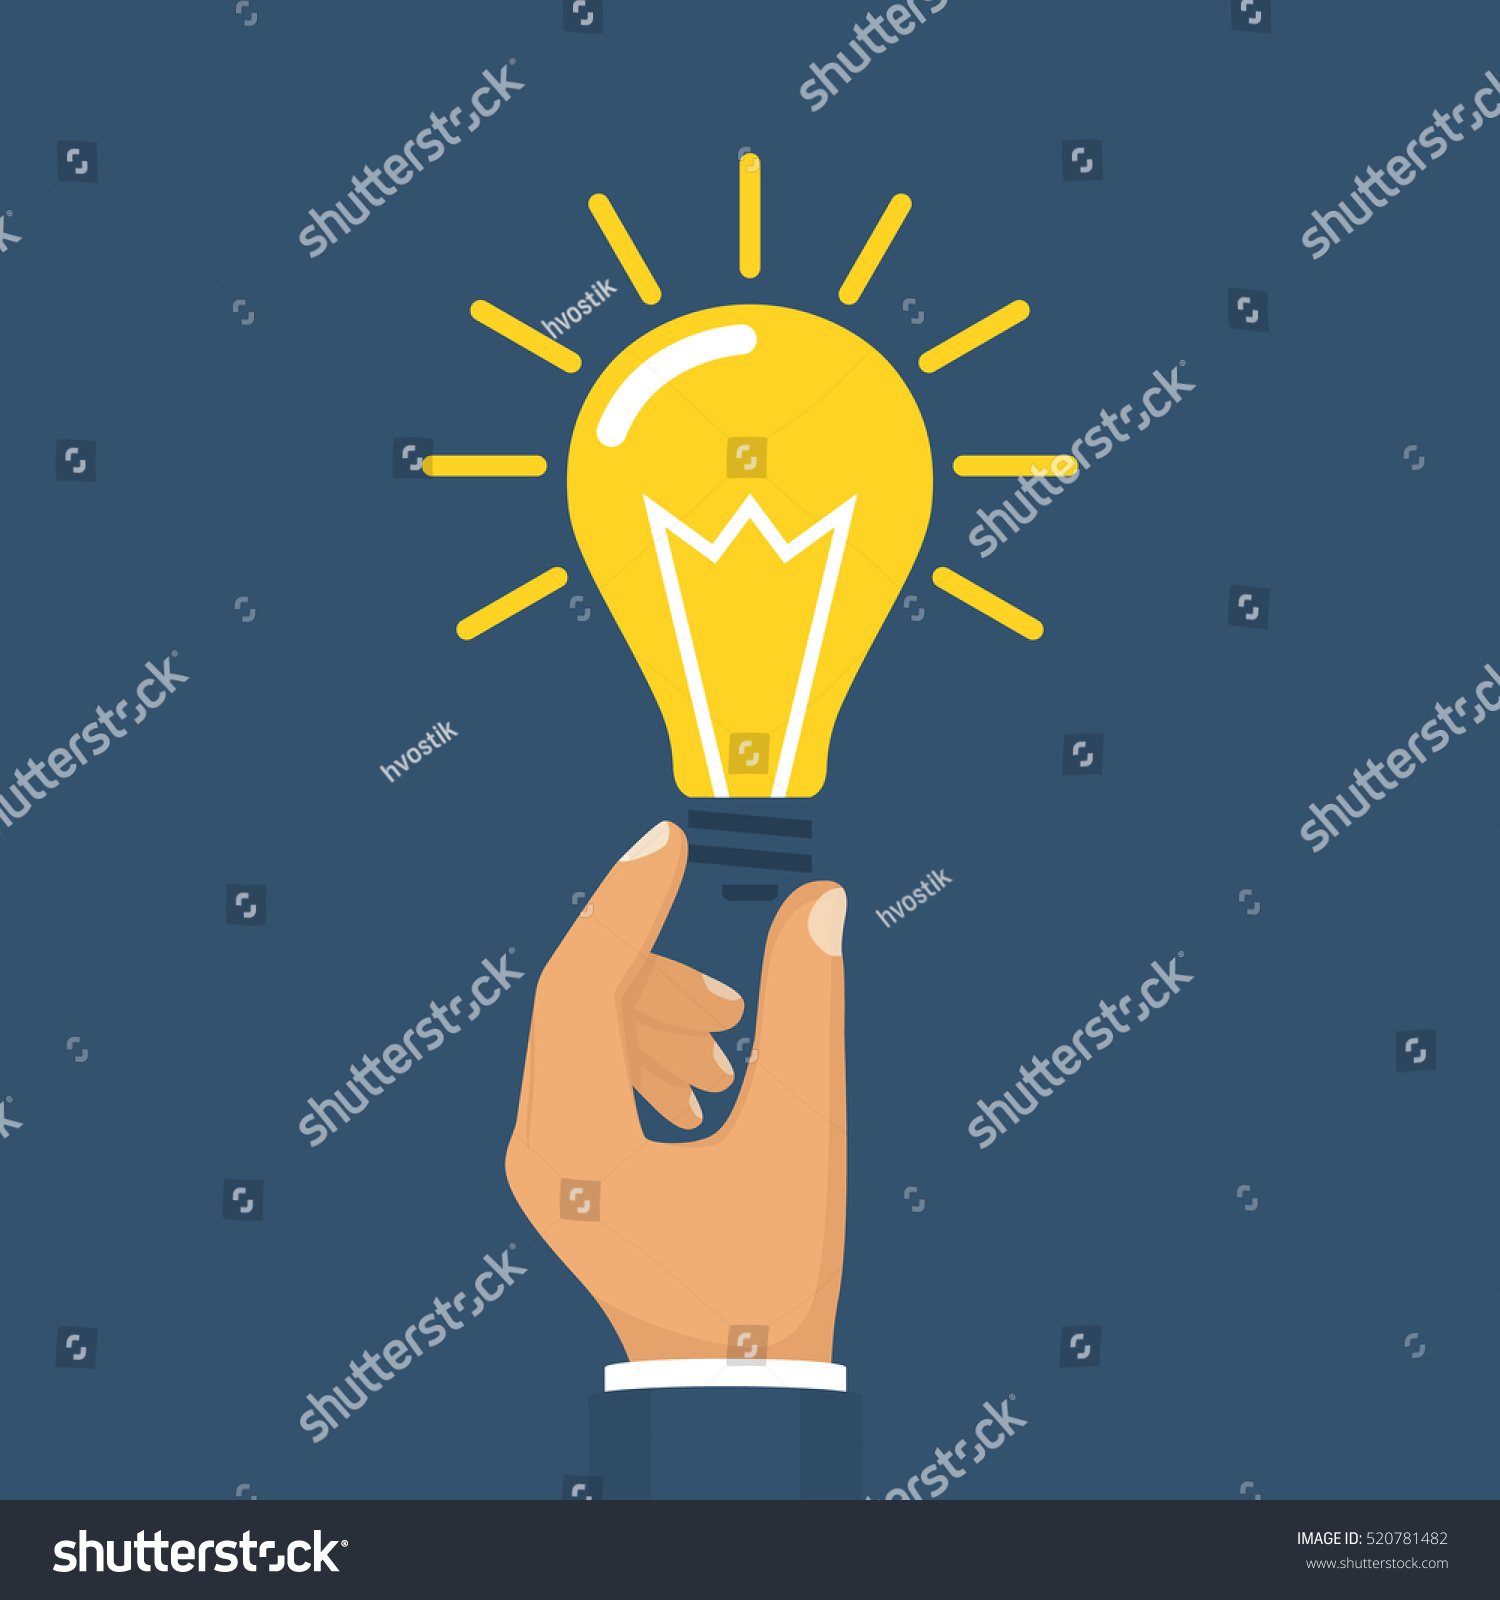 Technology Management Image: Hand Holding Lightbulb Concept Business Idea Stock Vector